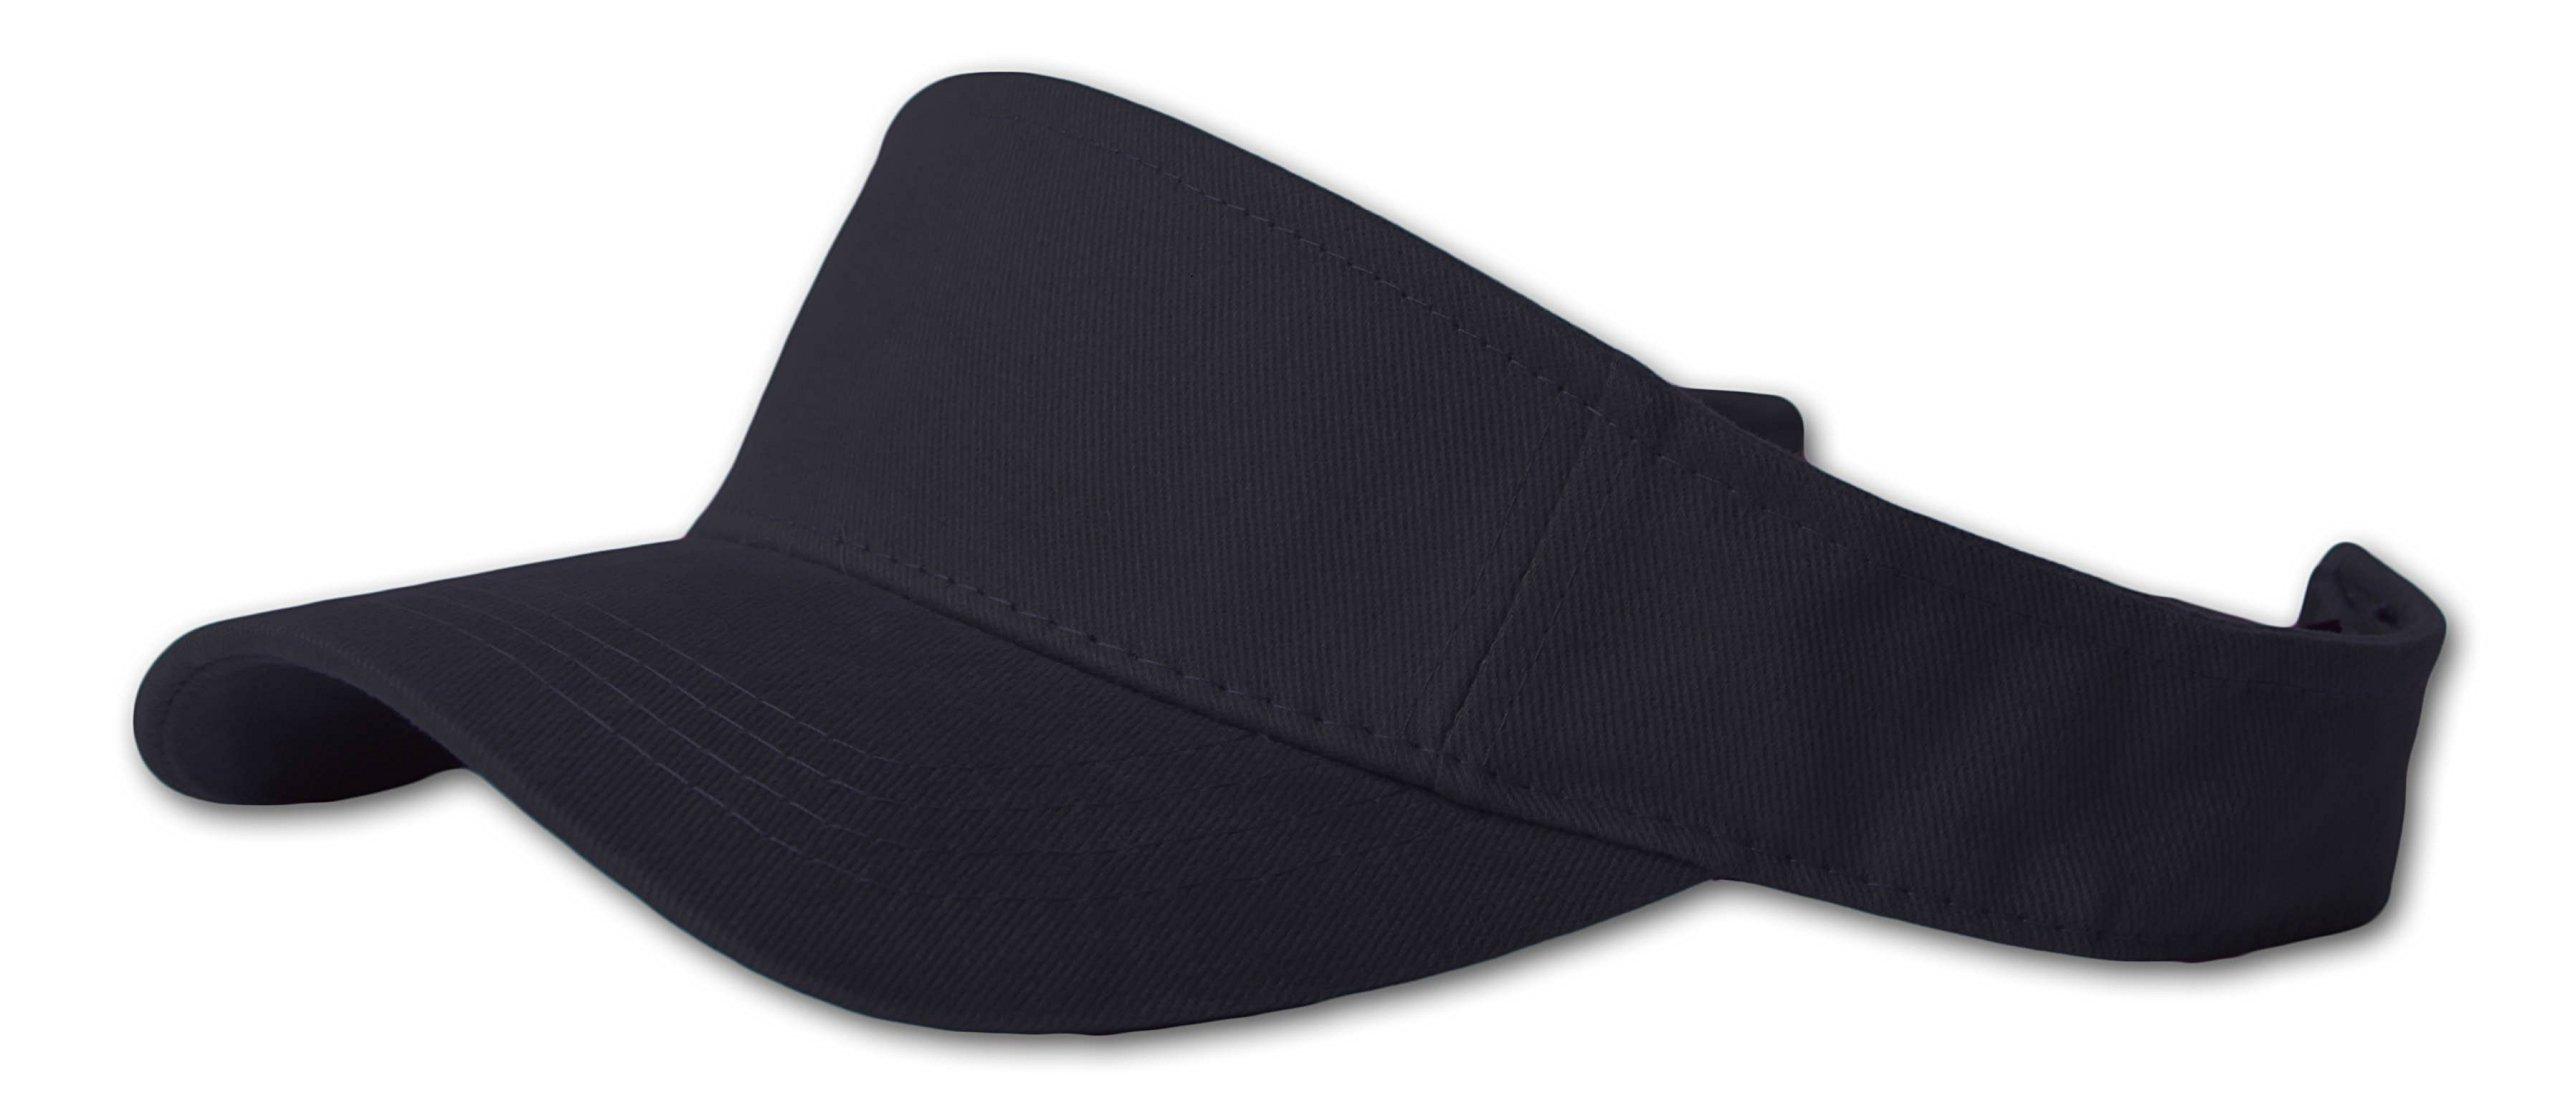 12 Lot (One Color) Visor Caps- Black